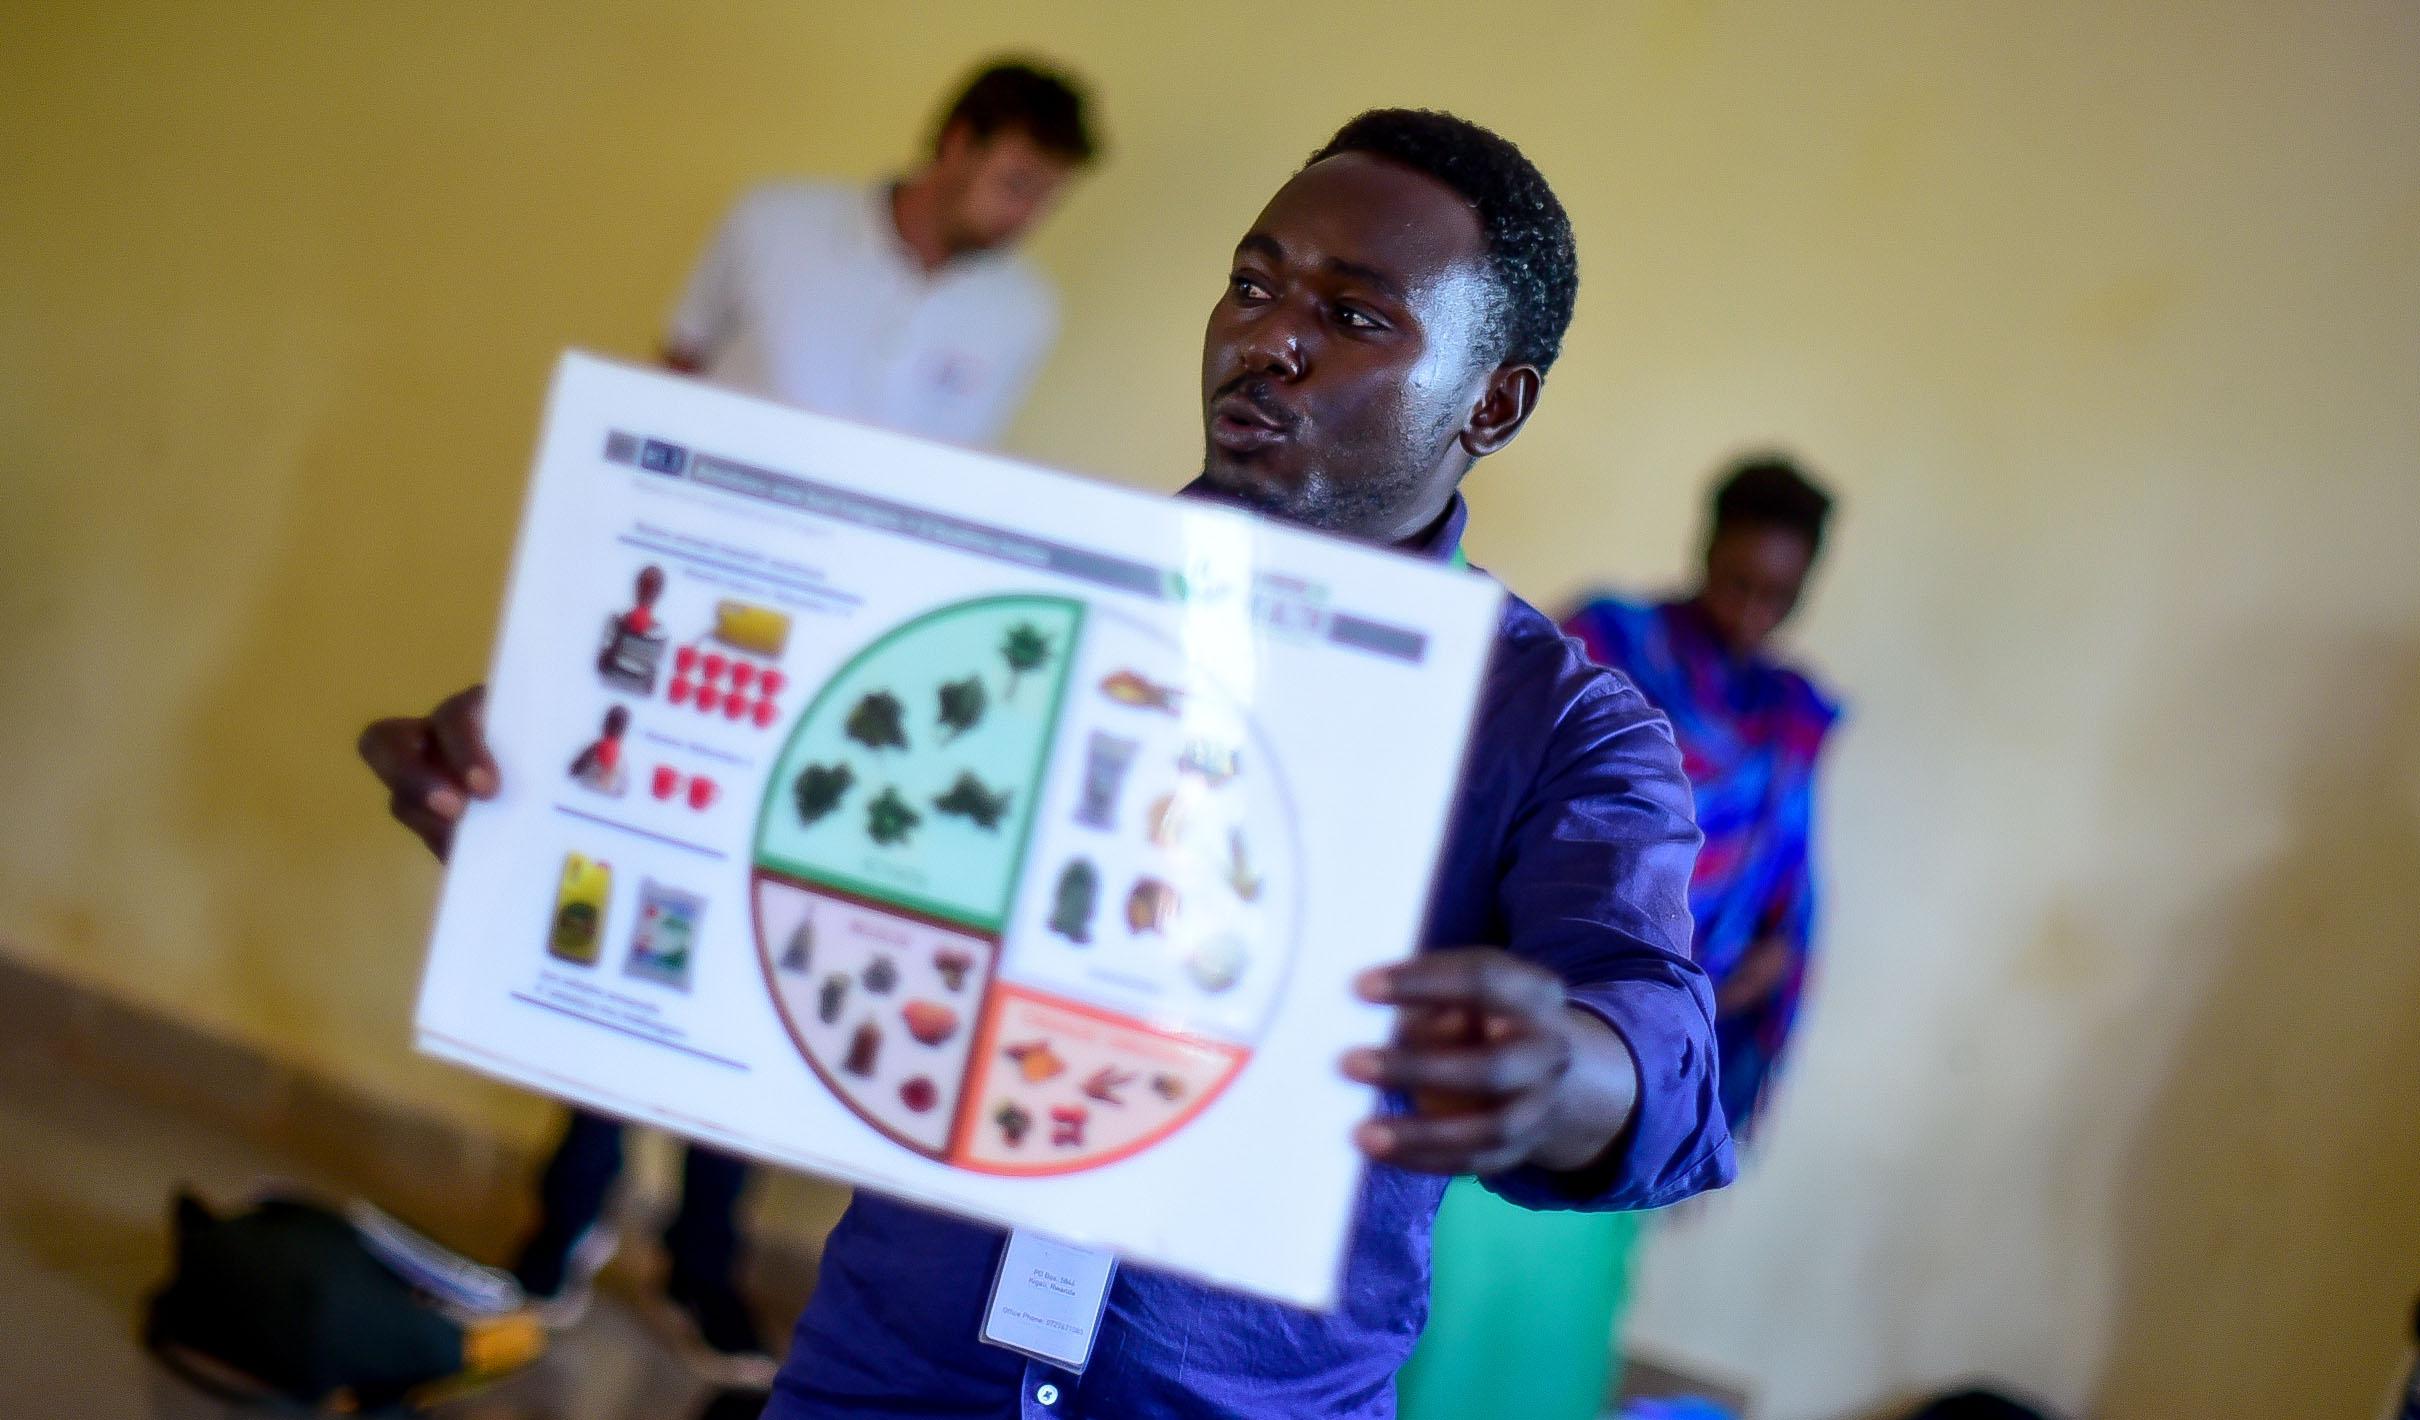 Field Educator Come Blaise Kubwinamana teaches GHI's four-color wheel of nutrition.